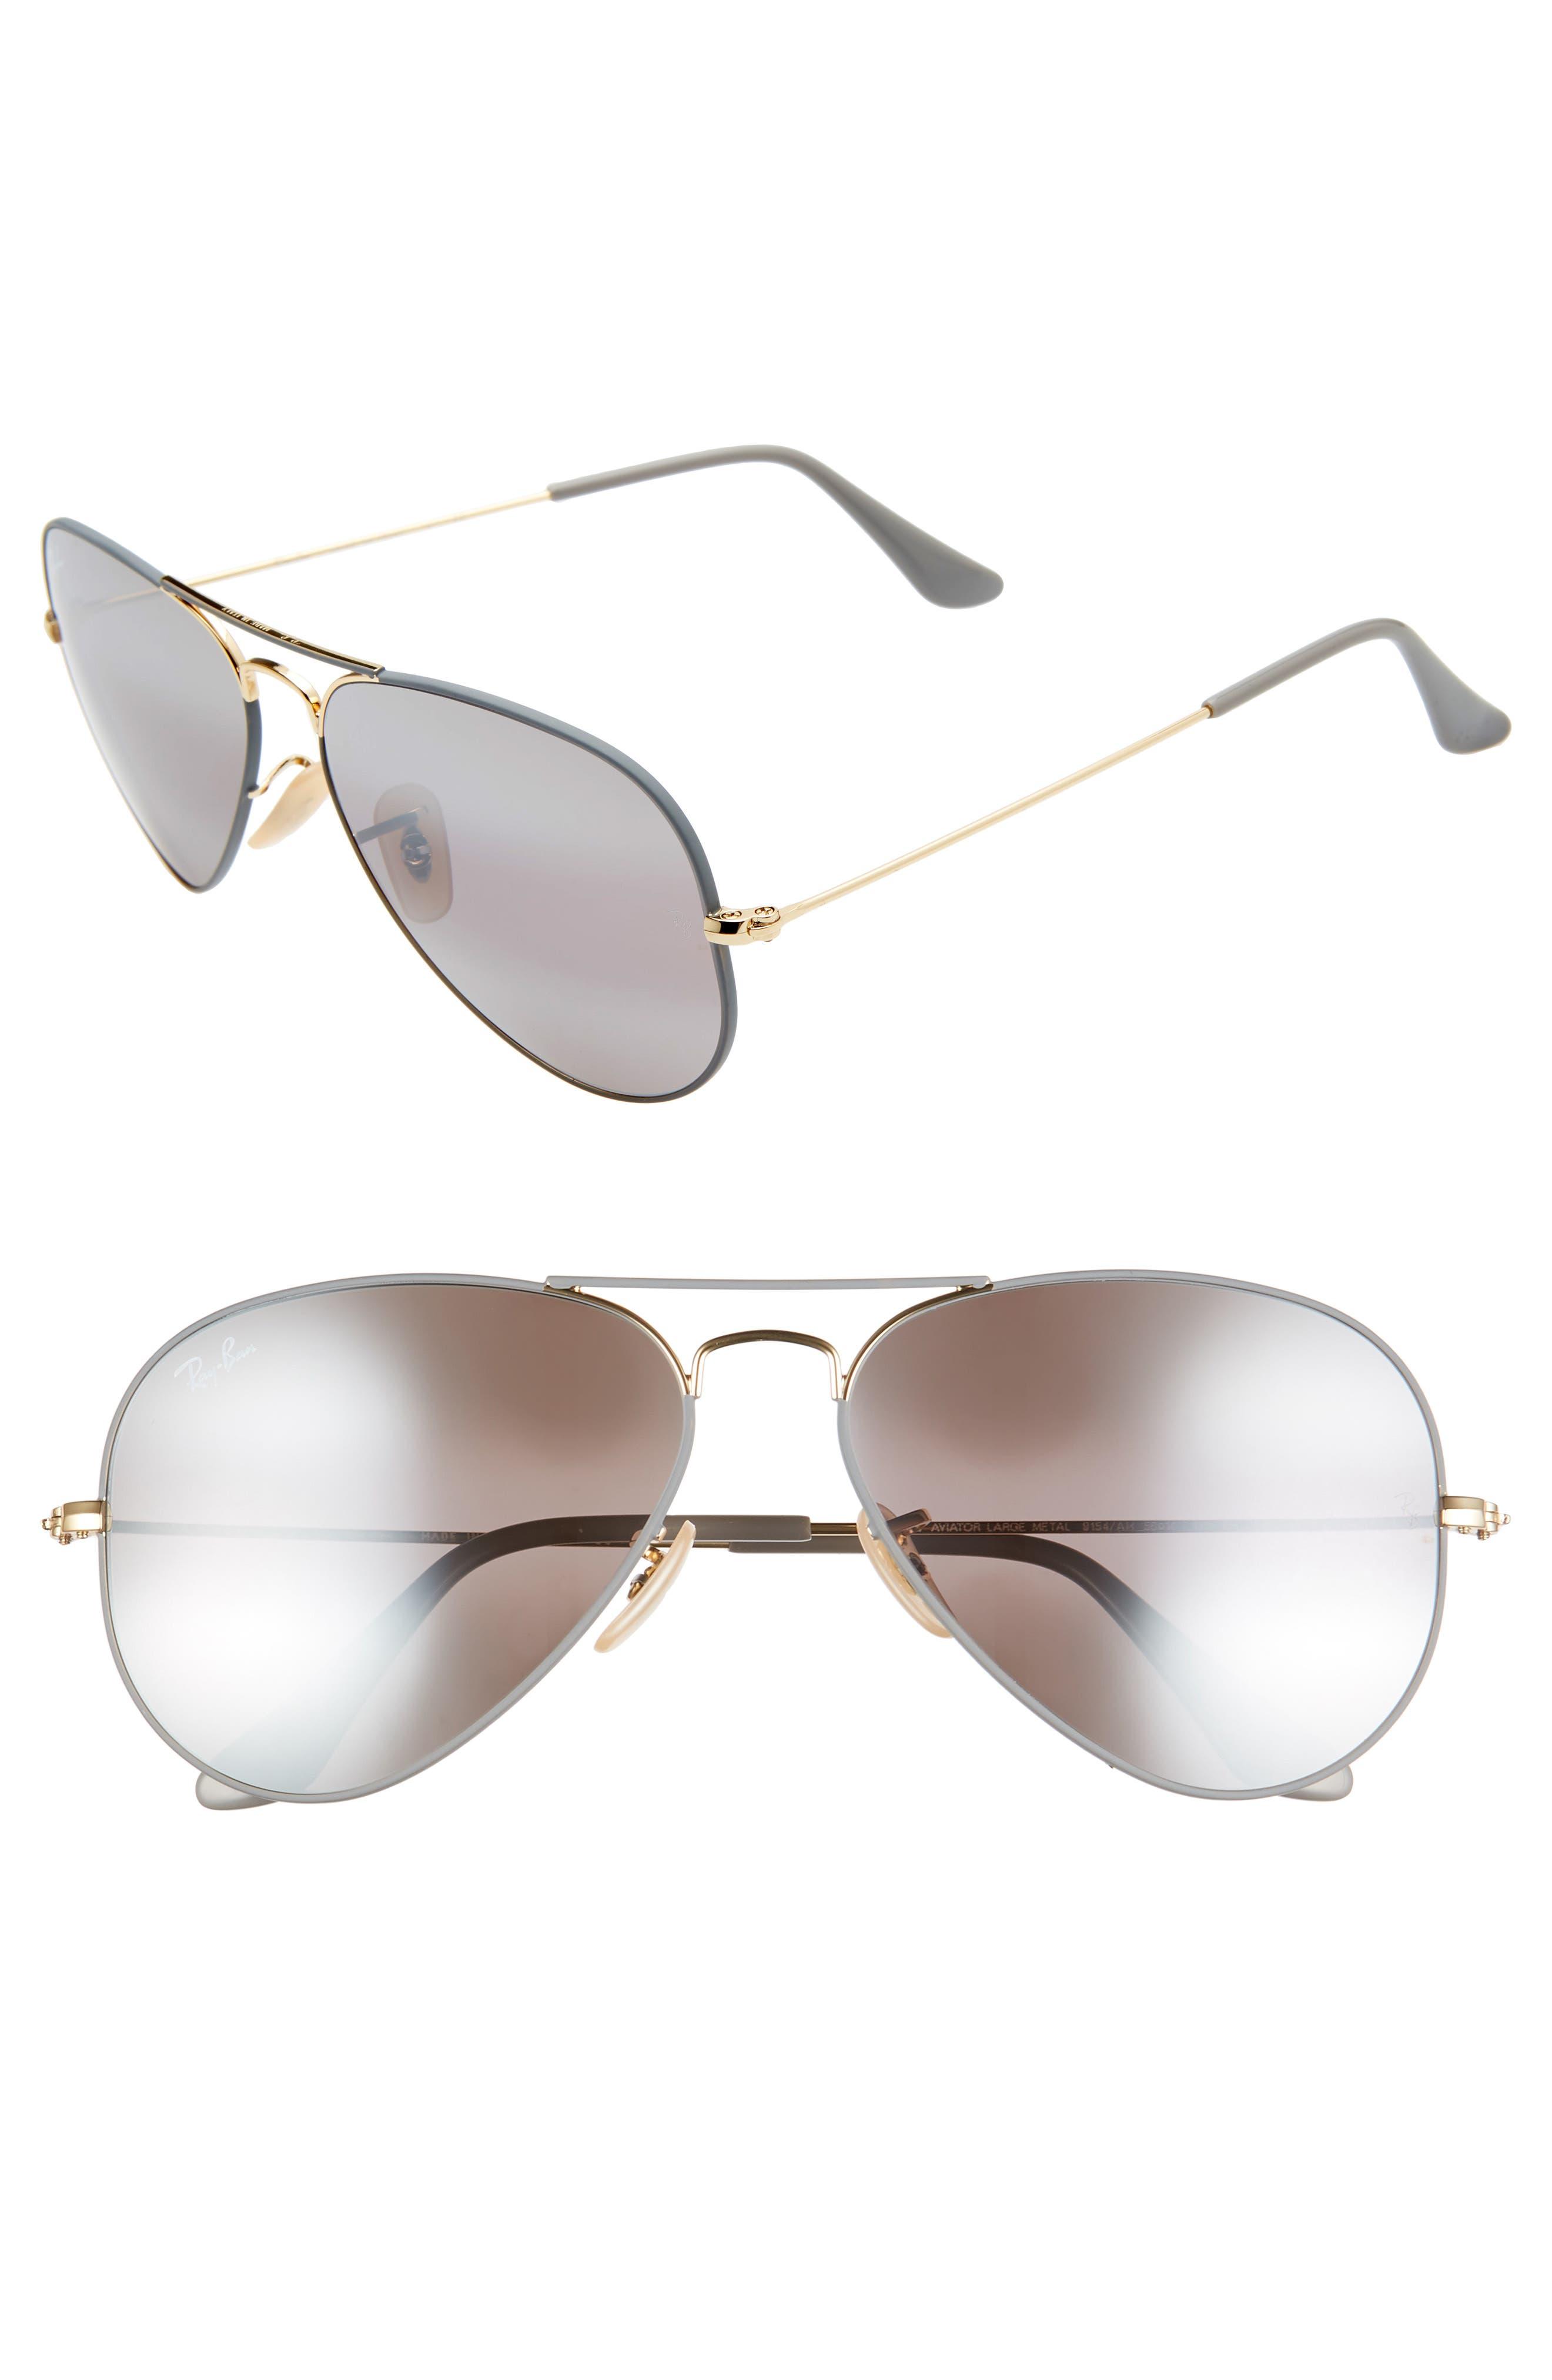 Ray-Ban Standard Original 5m Aviator Sunglasses - Grey/ Gold Mirror